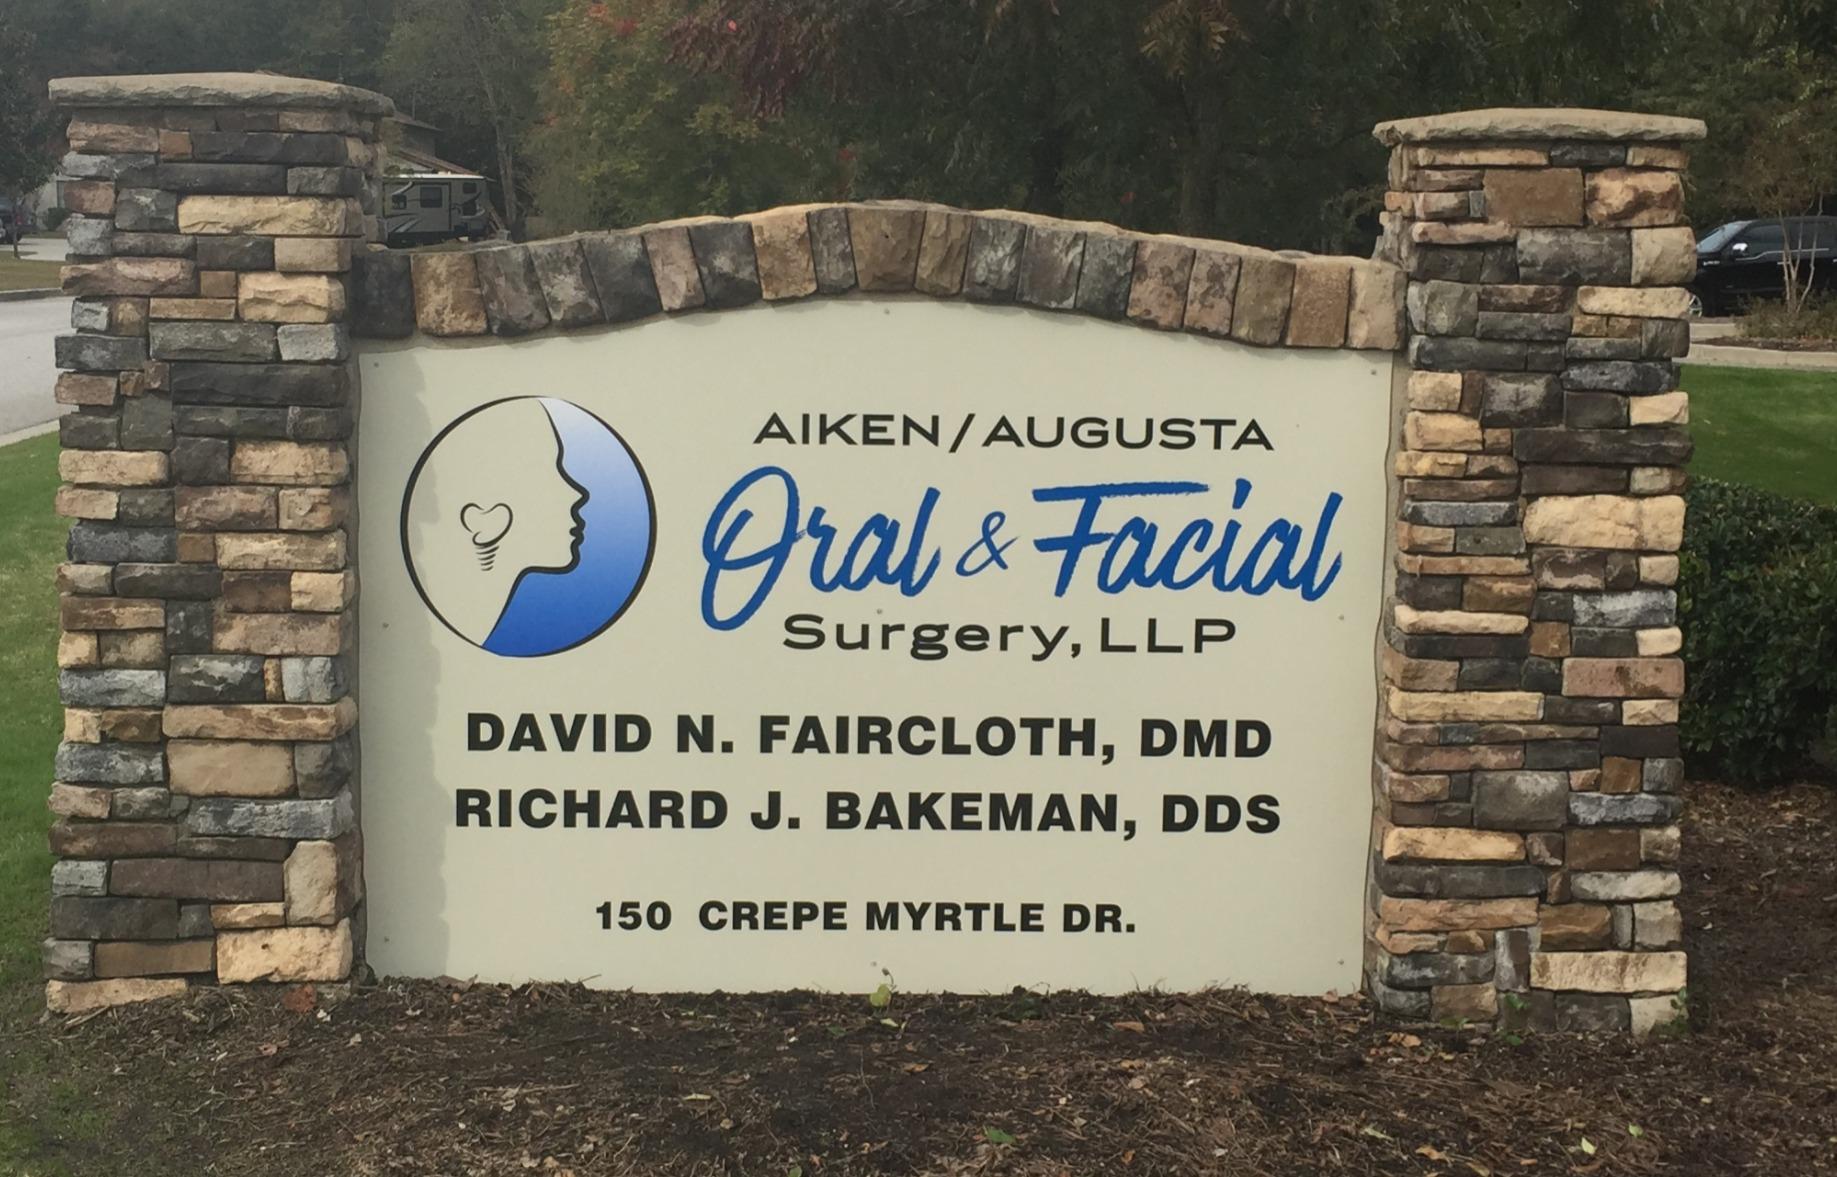 Aiken Augusta O&F_edited